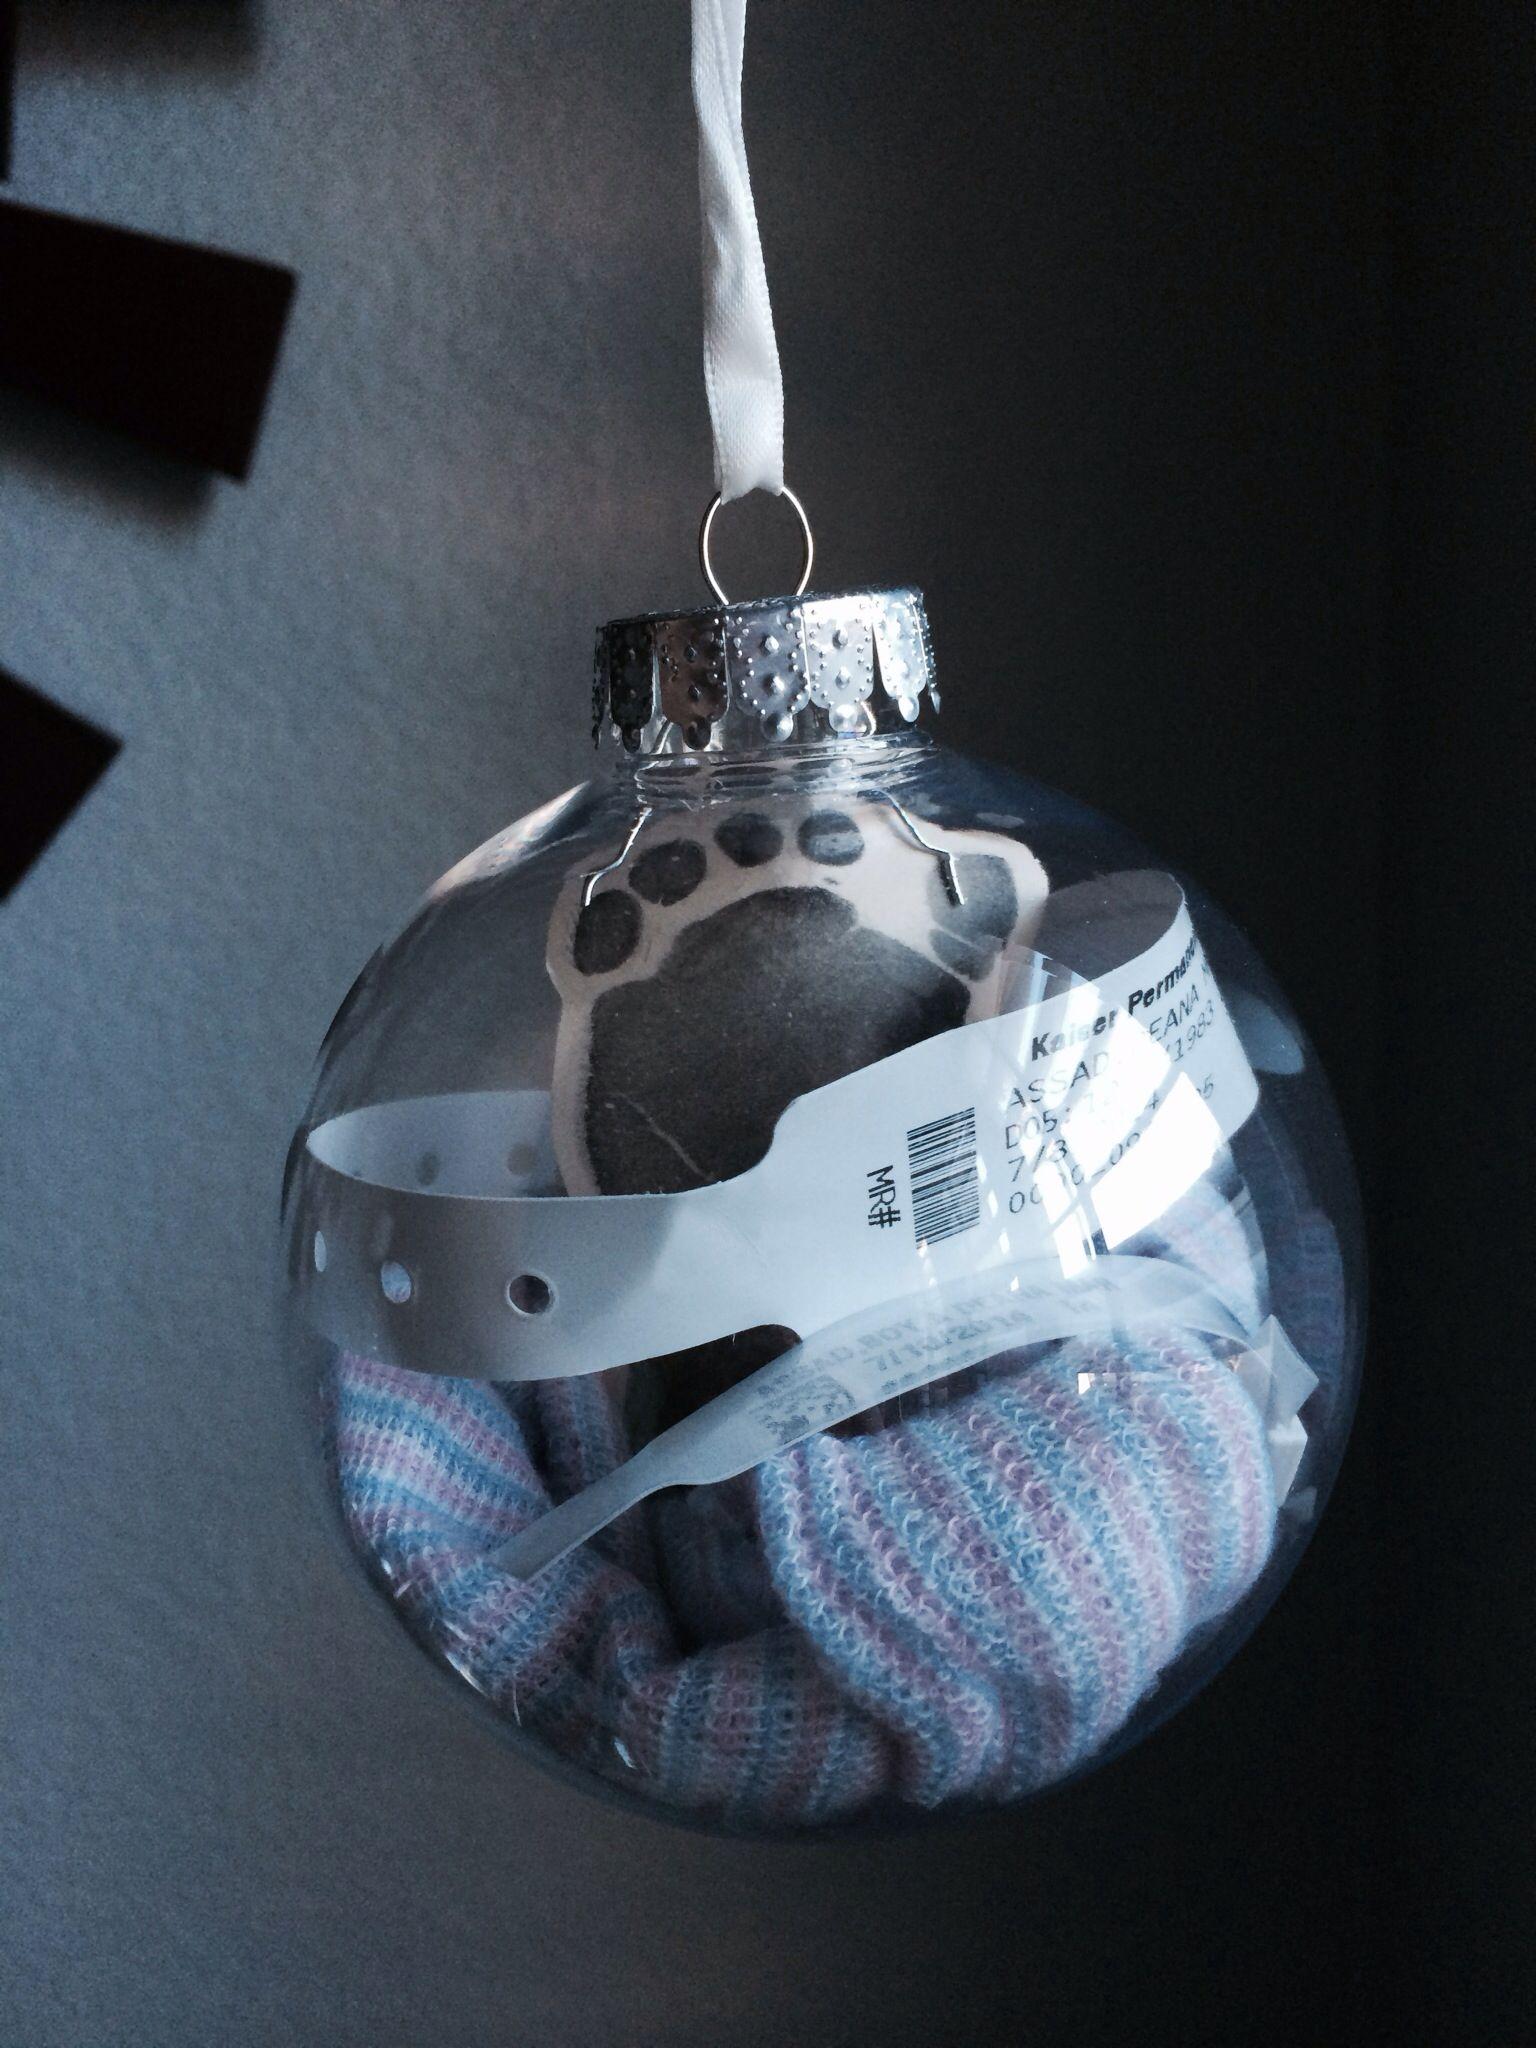 Christmas Ornament For Newborn Keepsake Hospital Bracelets Beanie And Ink Footprint